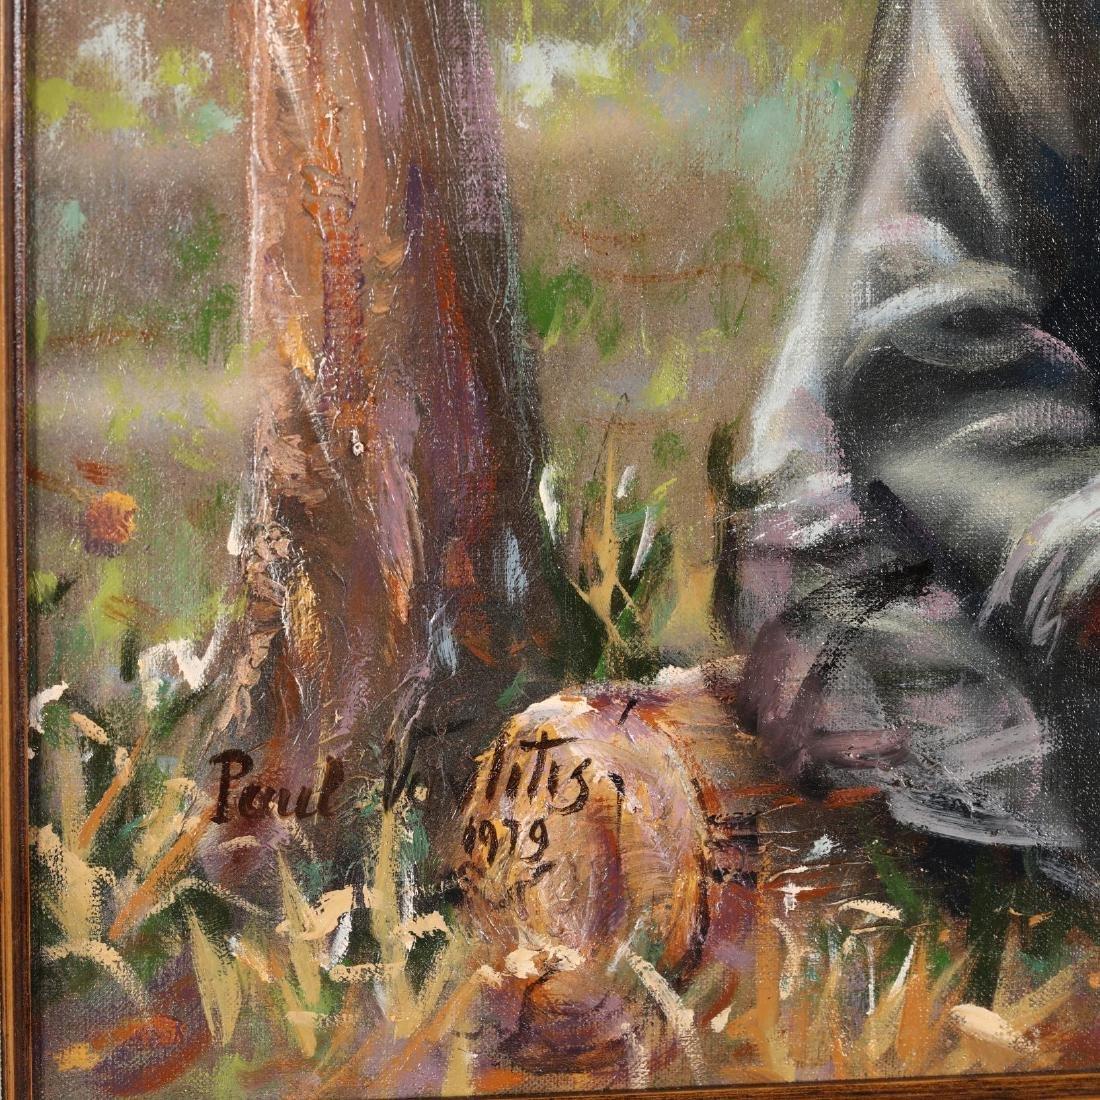 Paul Vavlitis (Cypriot-American, 1914-2004), Grieving - 2